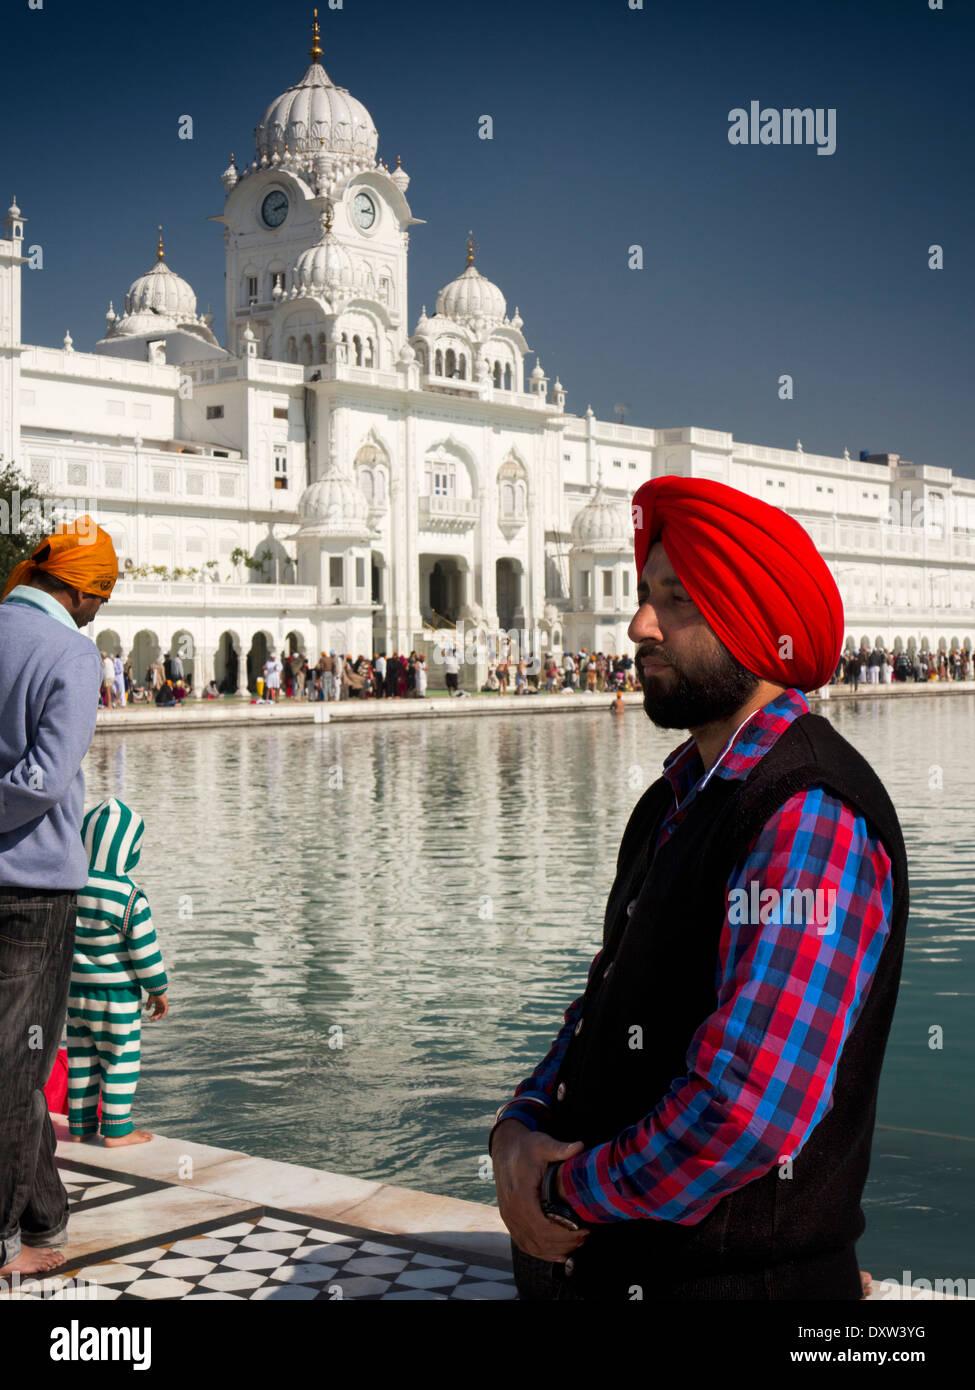 India, Punjab, Amritsar, Sri Harmandir or Darbar Sahib, Sikh man wearing red turban beside the Golden Temple Gurdwara Stock Photo